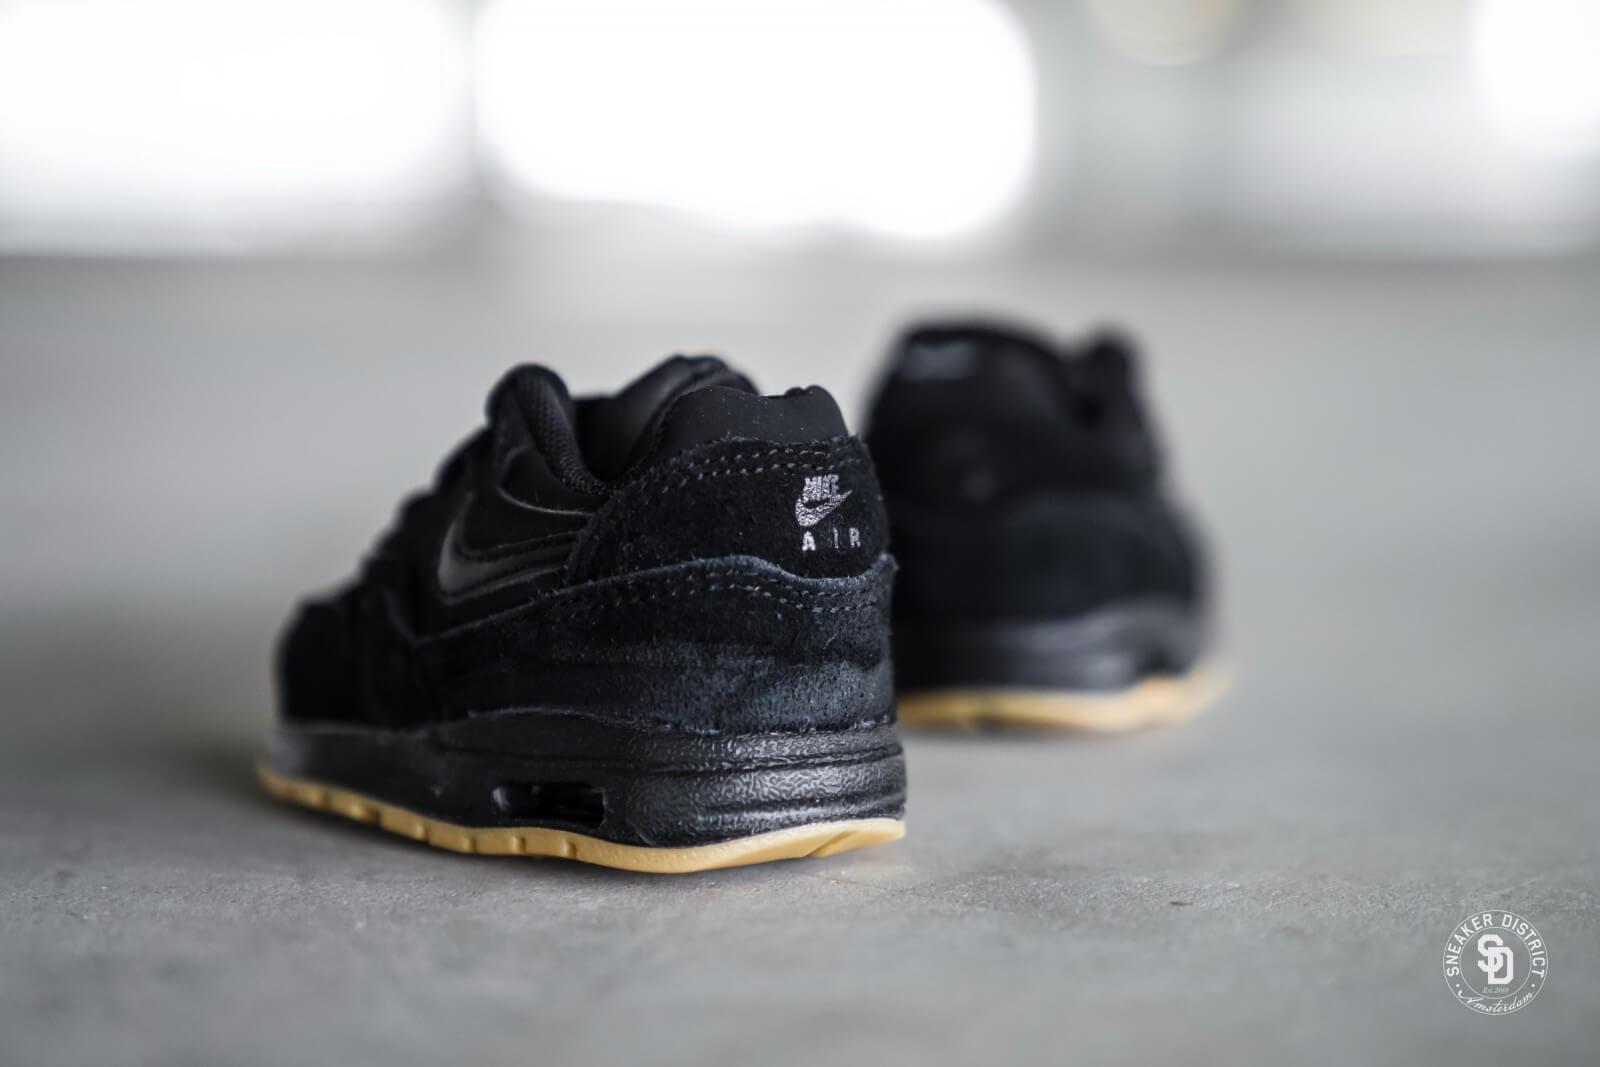 807604 008 Nike Air Max 1 TD BlackBlack Gum